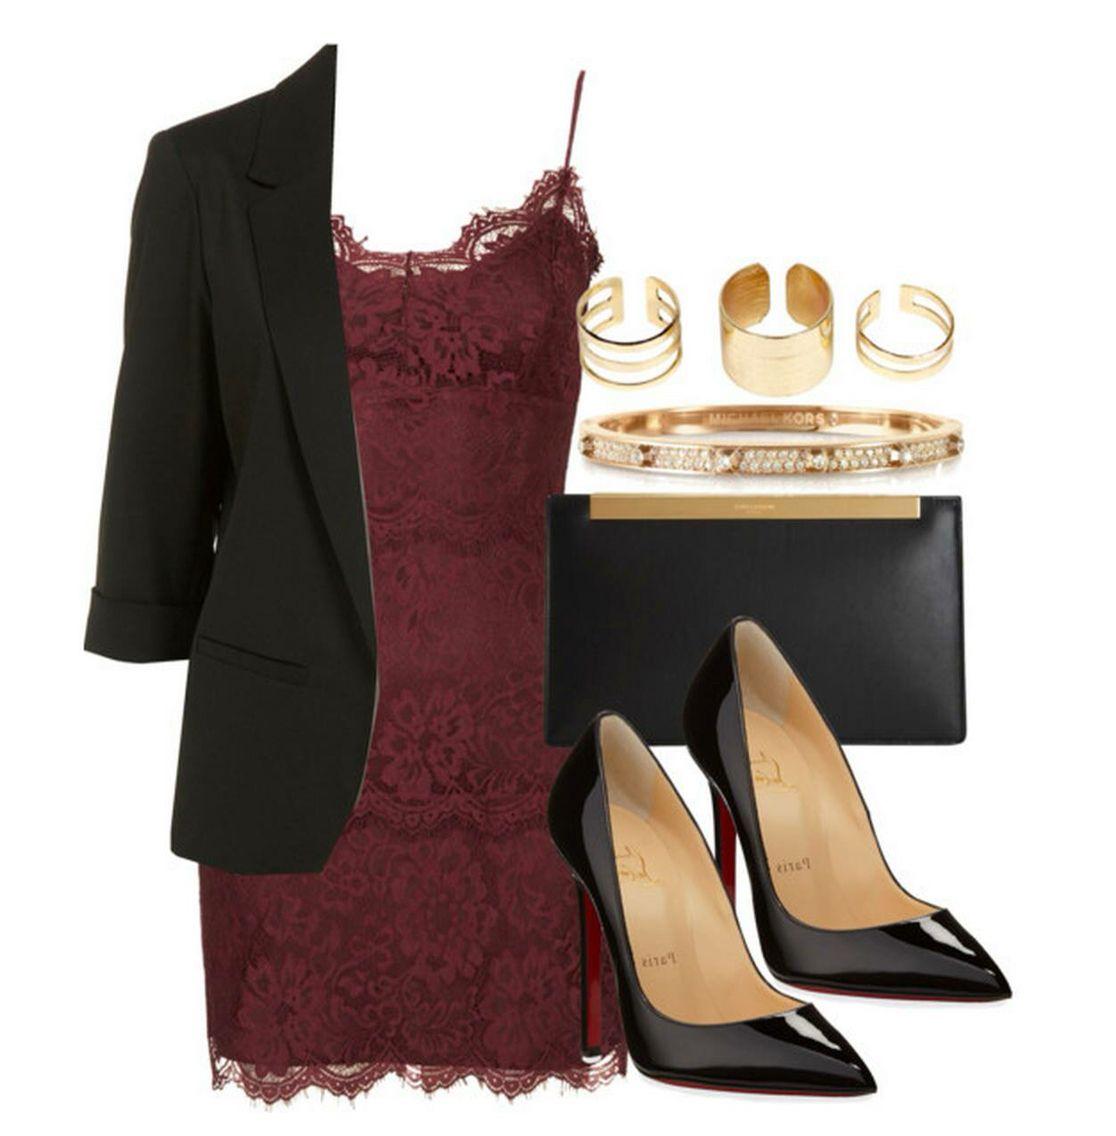 Burgandy Dress Black Gold Accessories Womens Fashion Inspiration Fashion Dressy Casual [ 1136 x 1116 Pixel ]